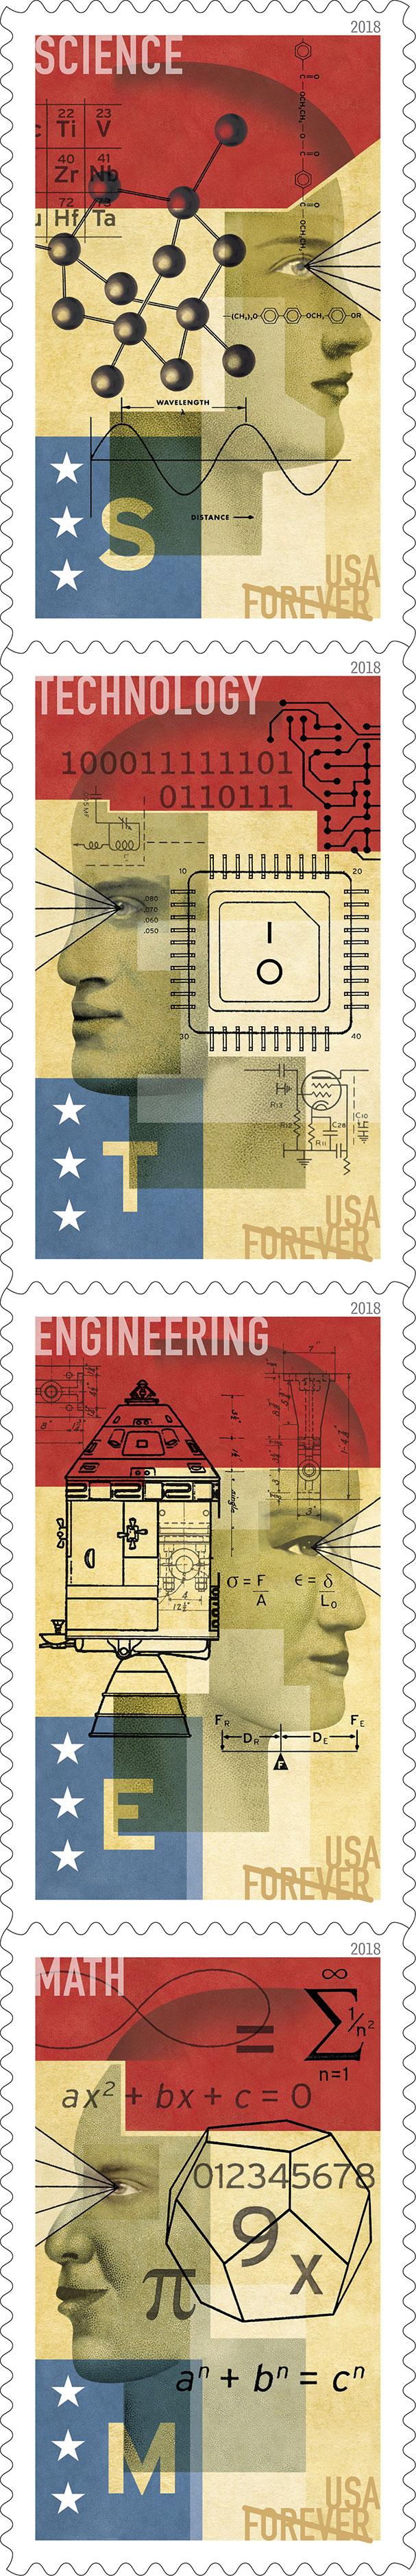 USPS 2018 STEM Education Apollo Stamp